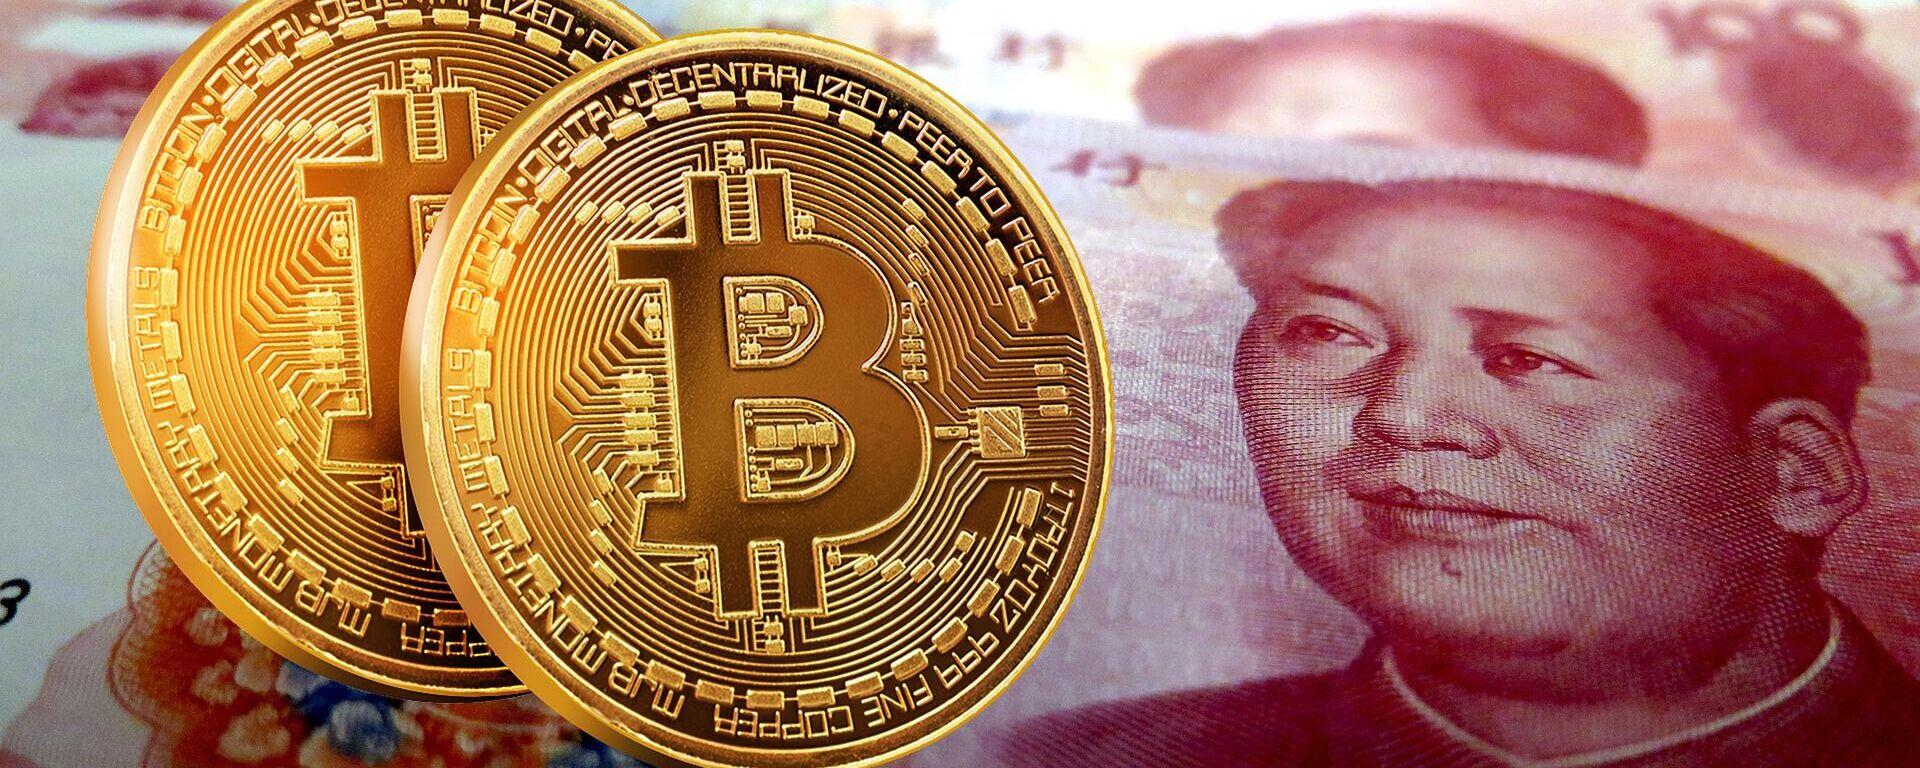 Yuan y bitcóin - Sputnik Mundo, 1920, 02.05.2021